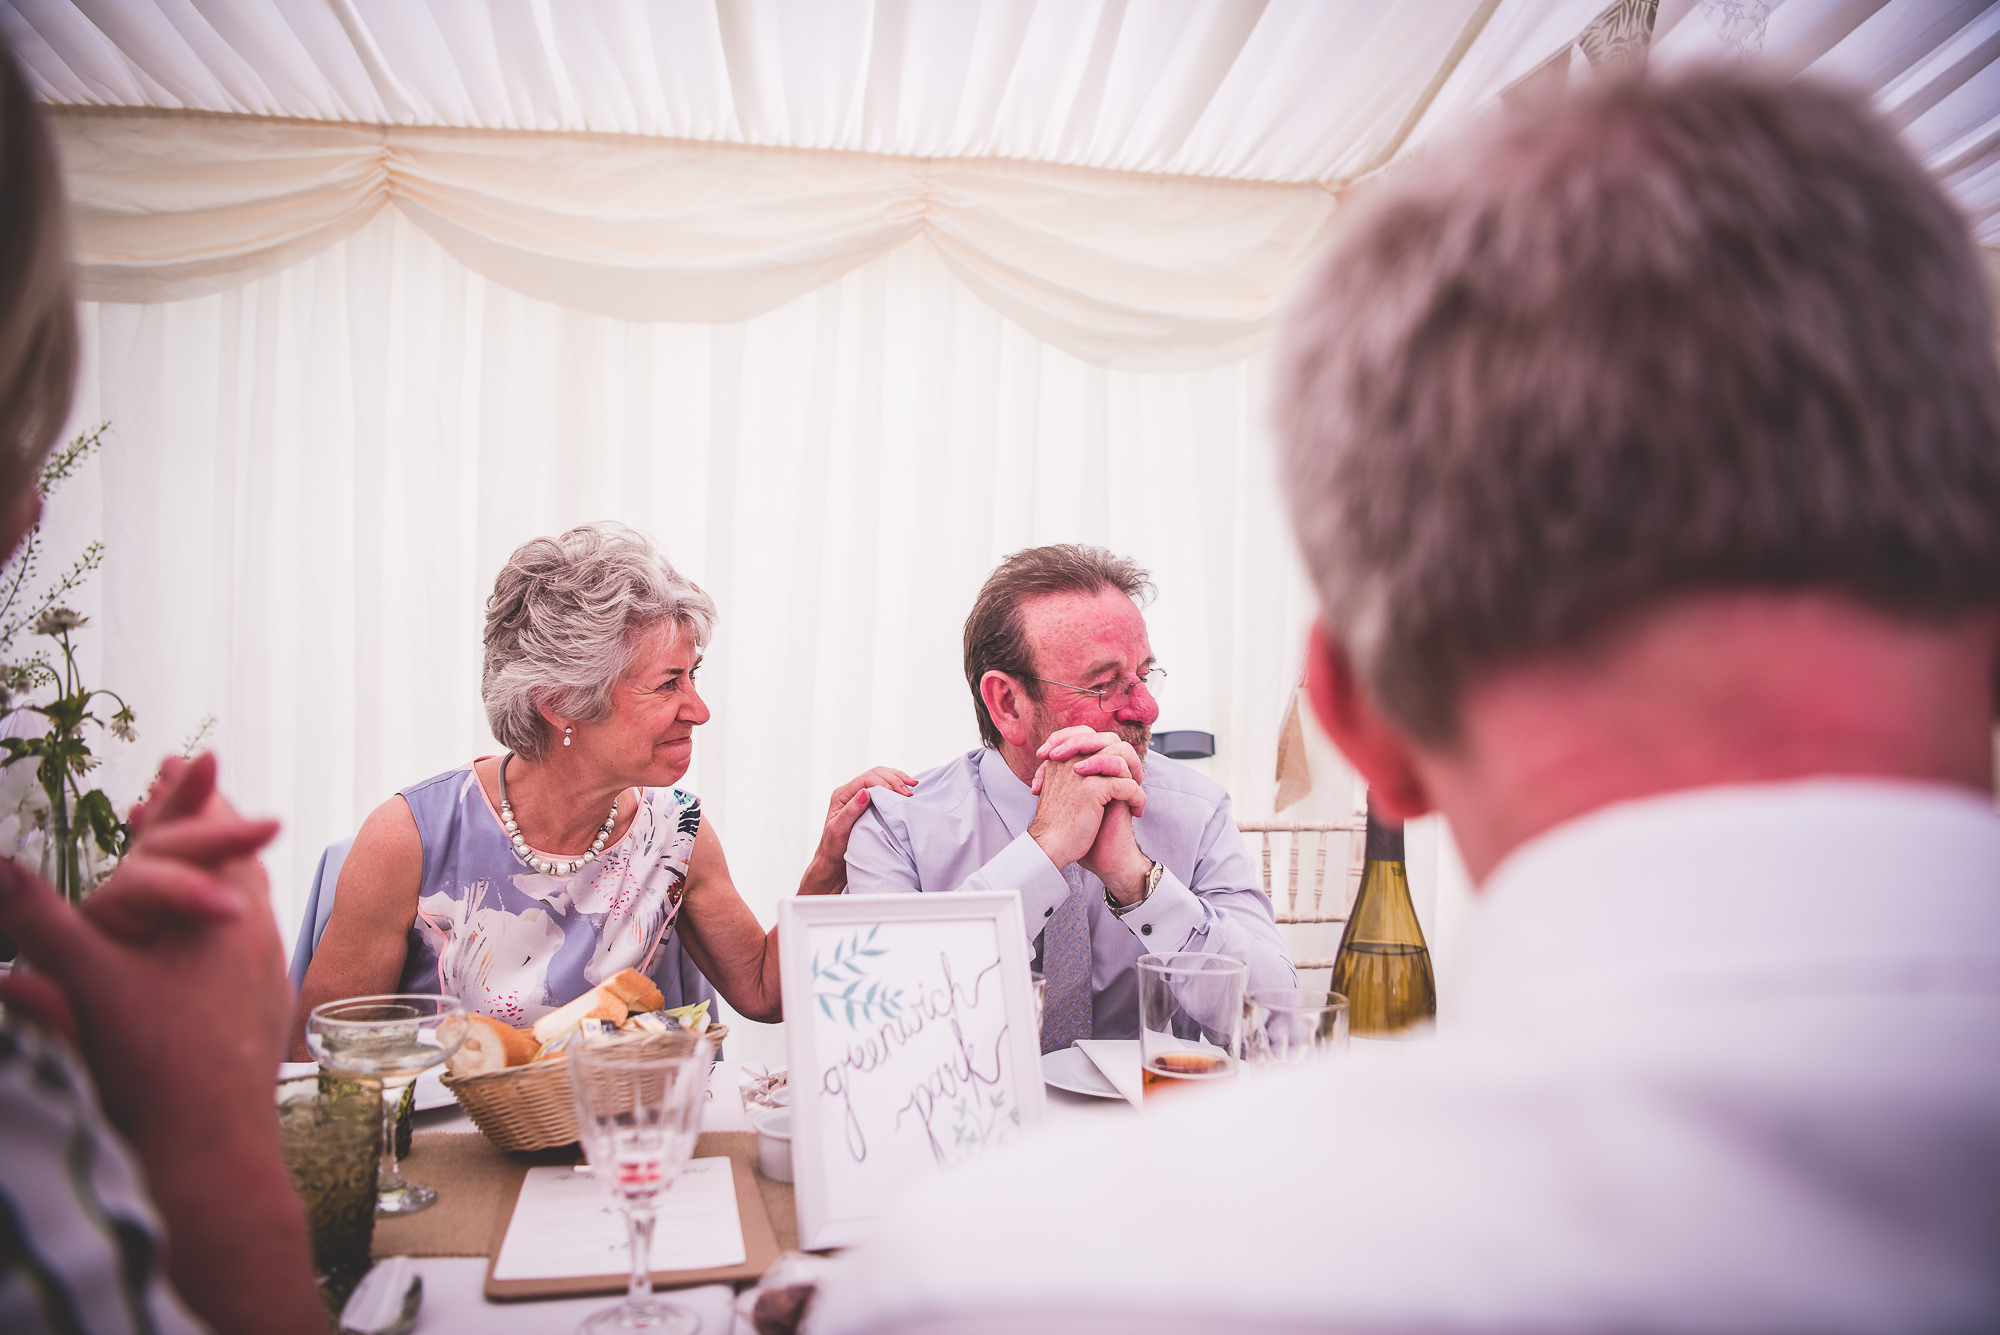 Veils & Bales Wedding Photography | Charlie & Steve SCSS 188